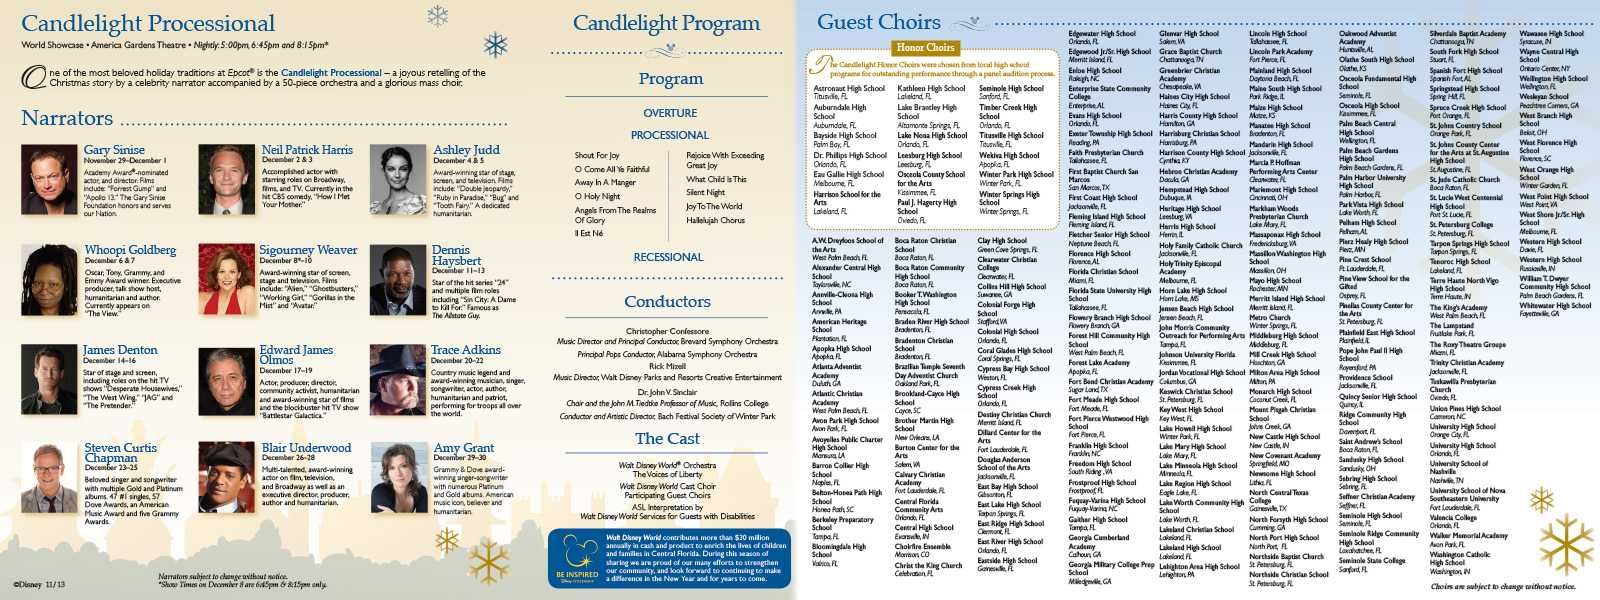 2013 Holidays Around the World guide - 2